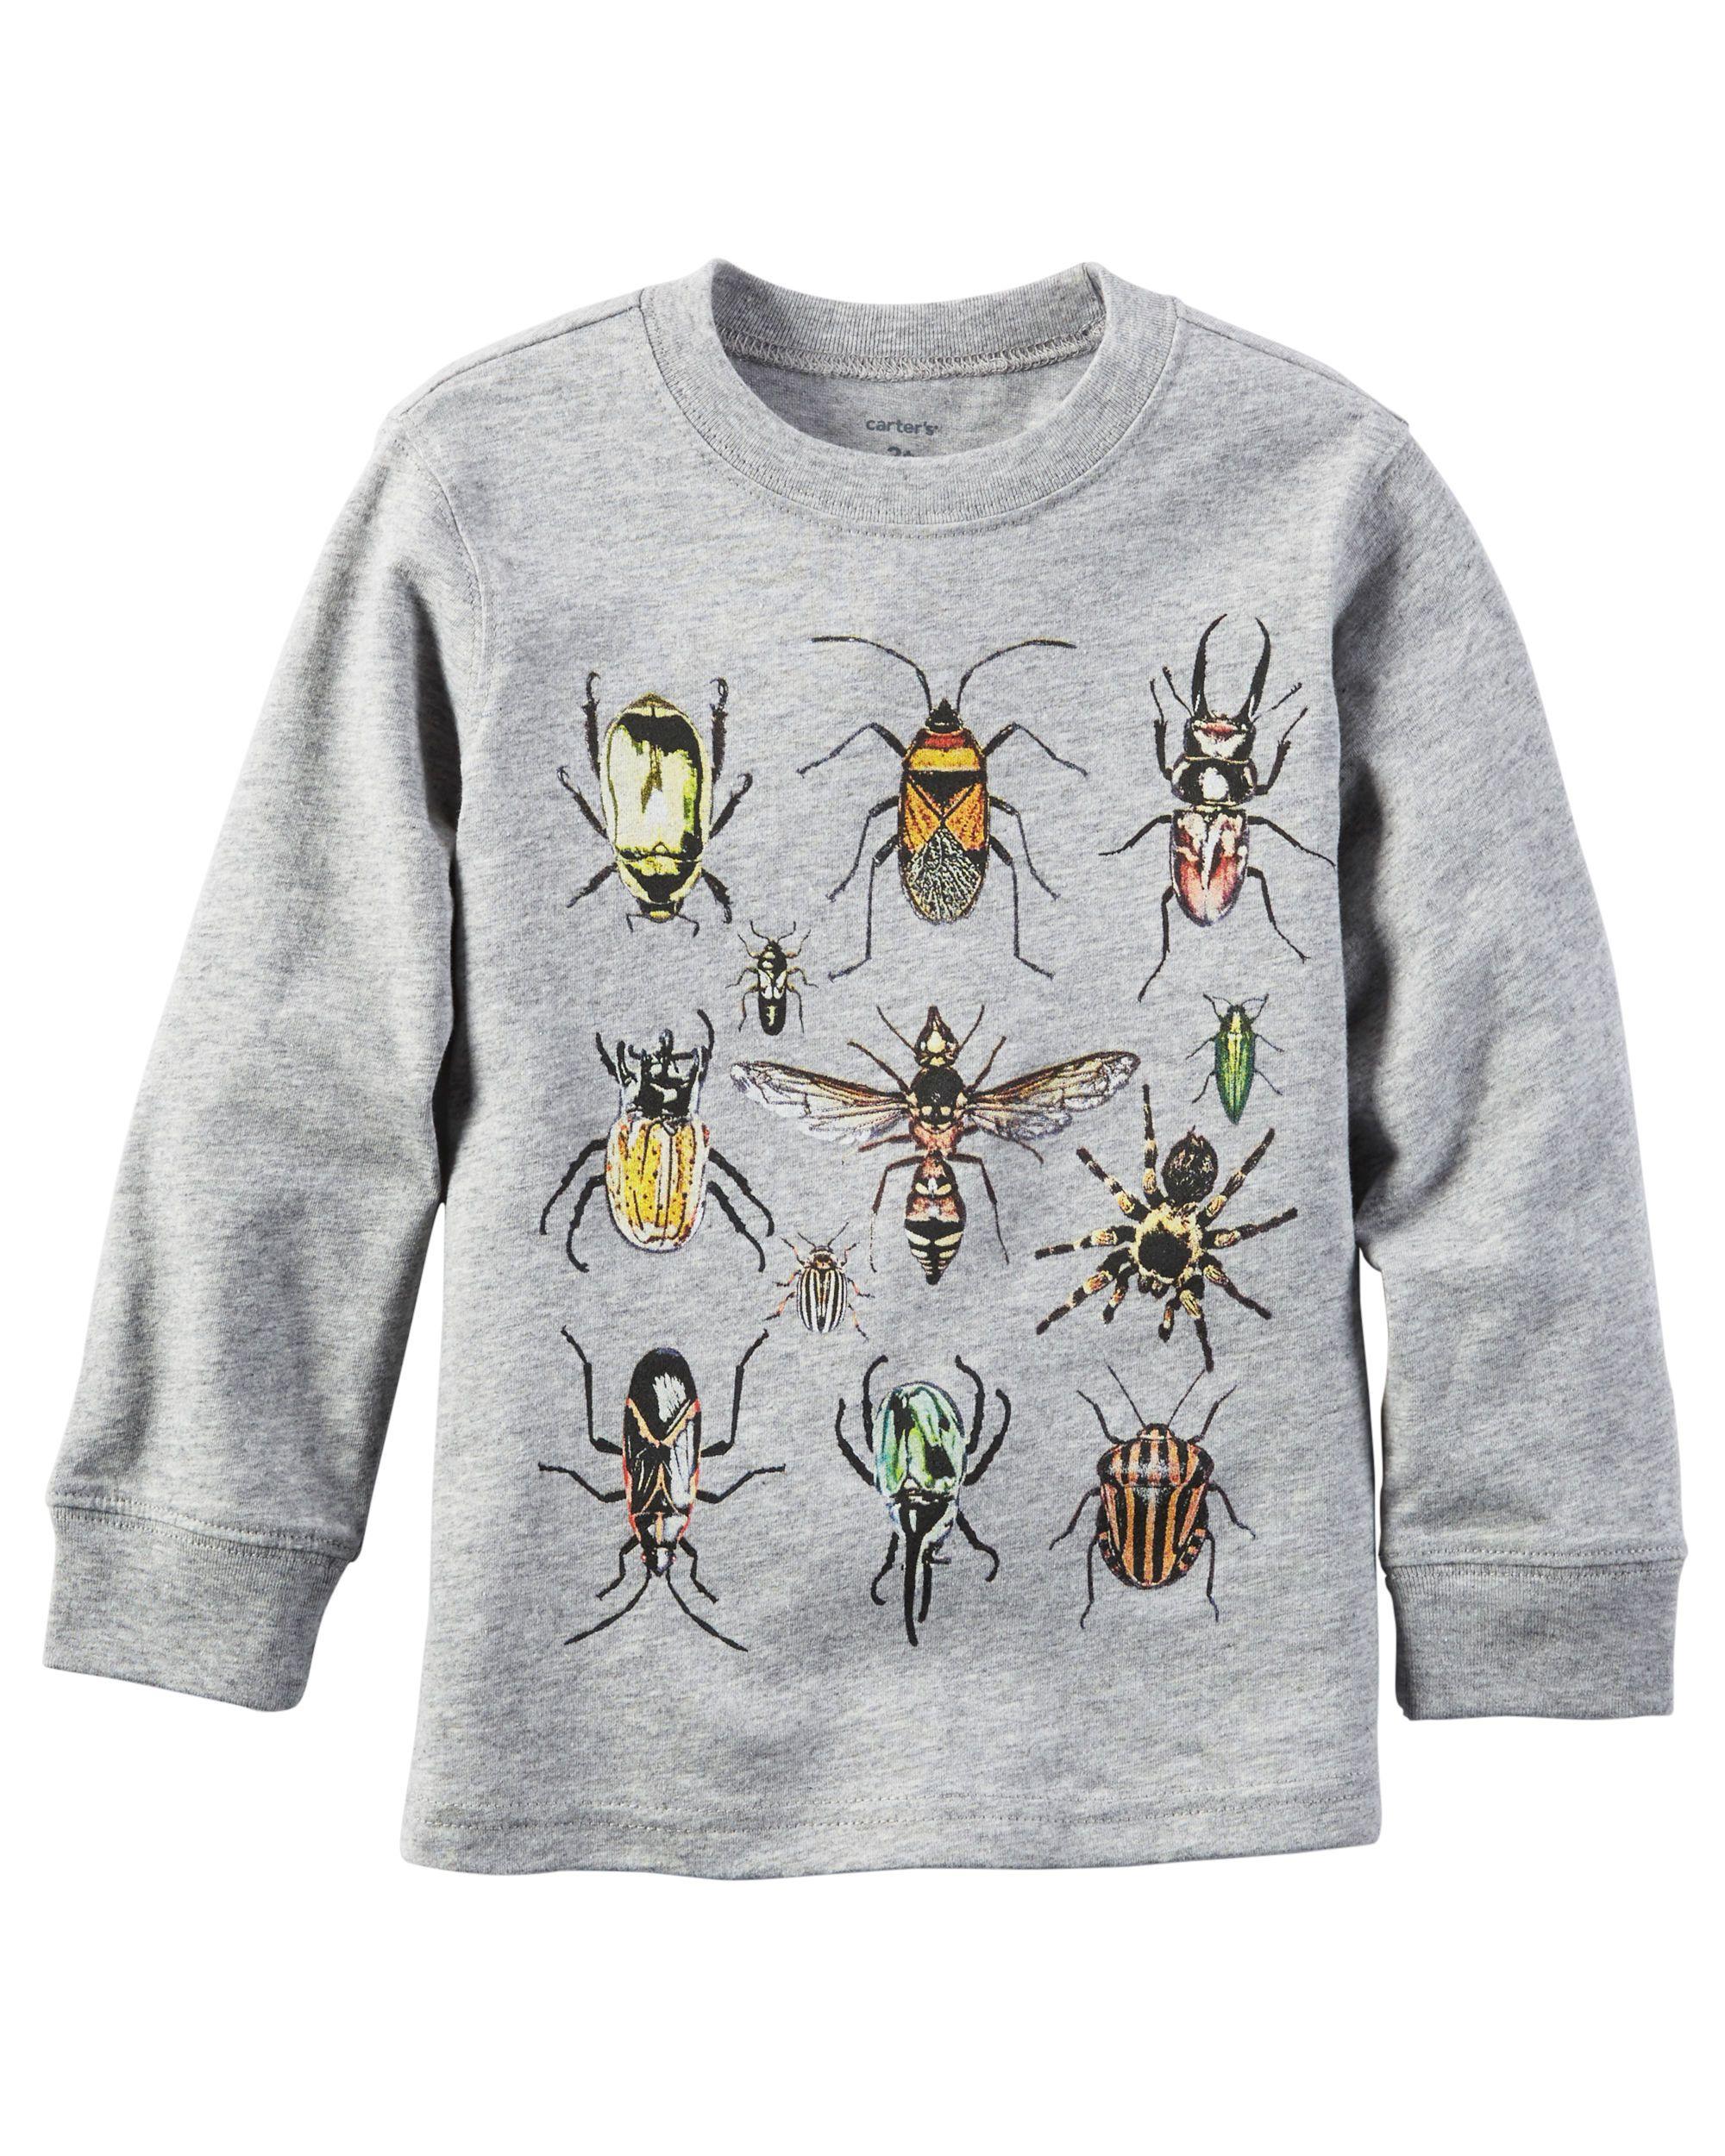 Baby Boy Long-Sleeve Bug Graphic Tee | Carters.com | Kids ...